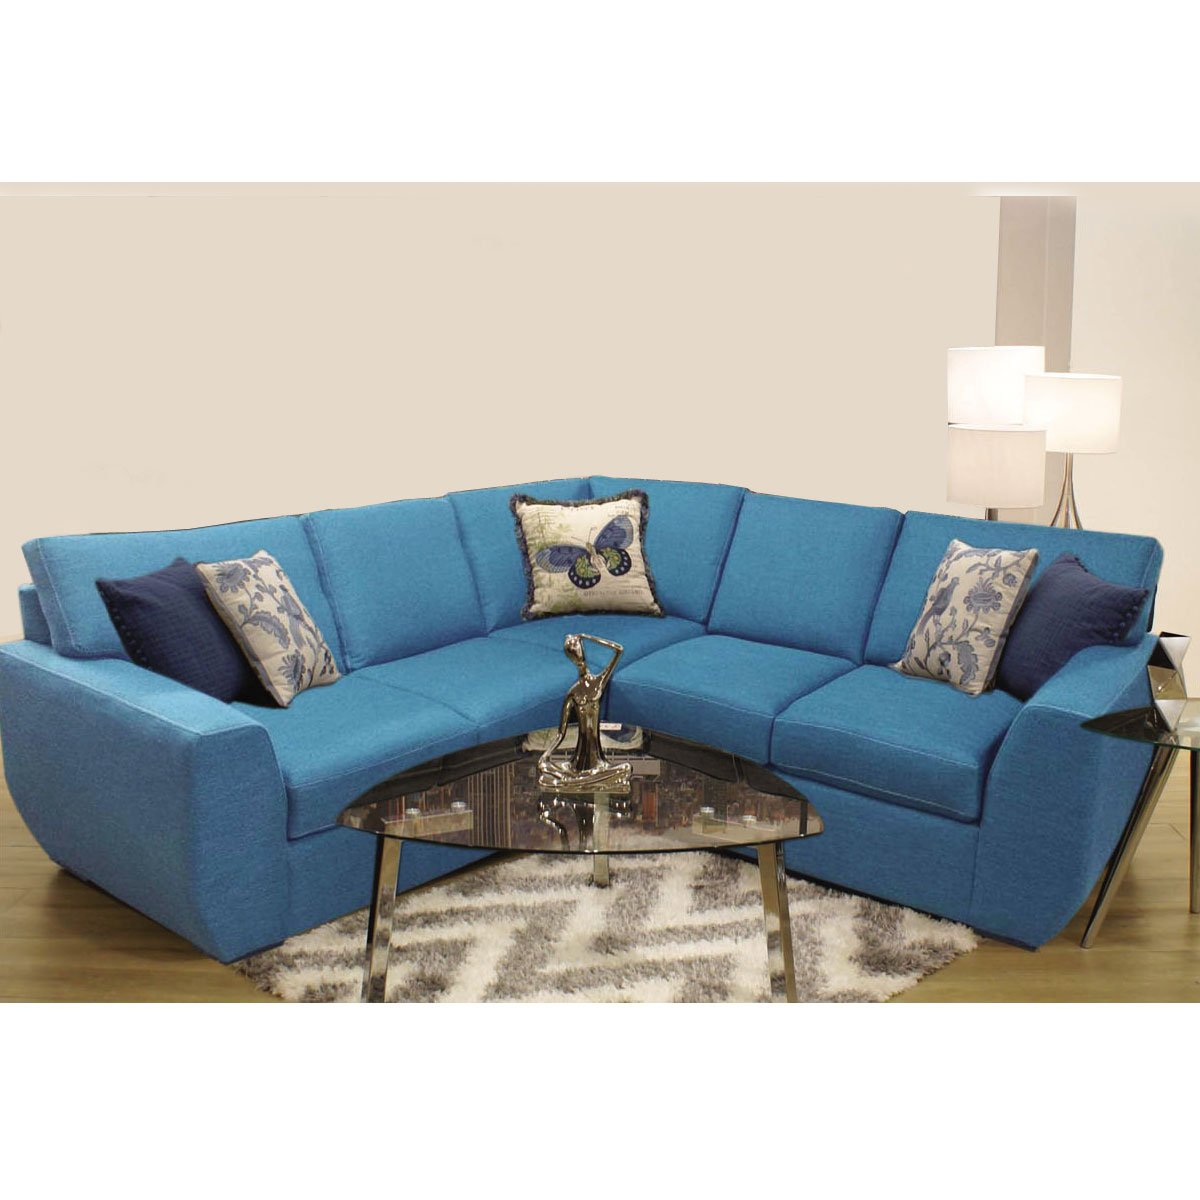 Modular Garies 2 Piezas Izquierdo Azul Muebles Liz Sears Com Mx  # Muebles Liz Sears